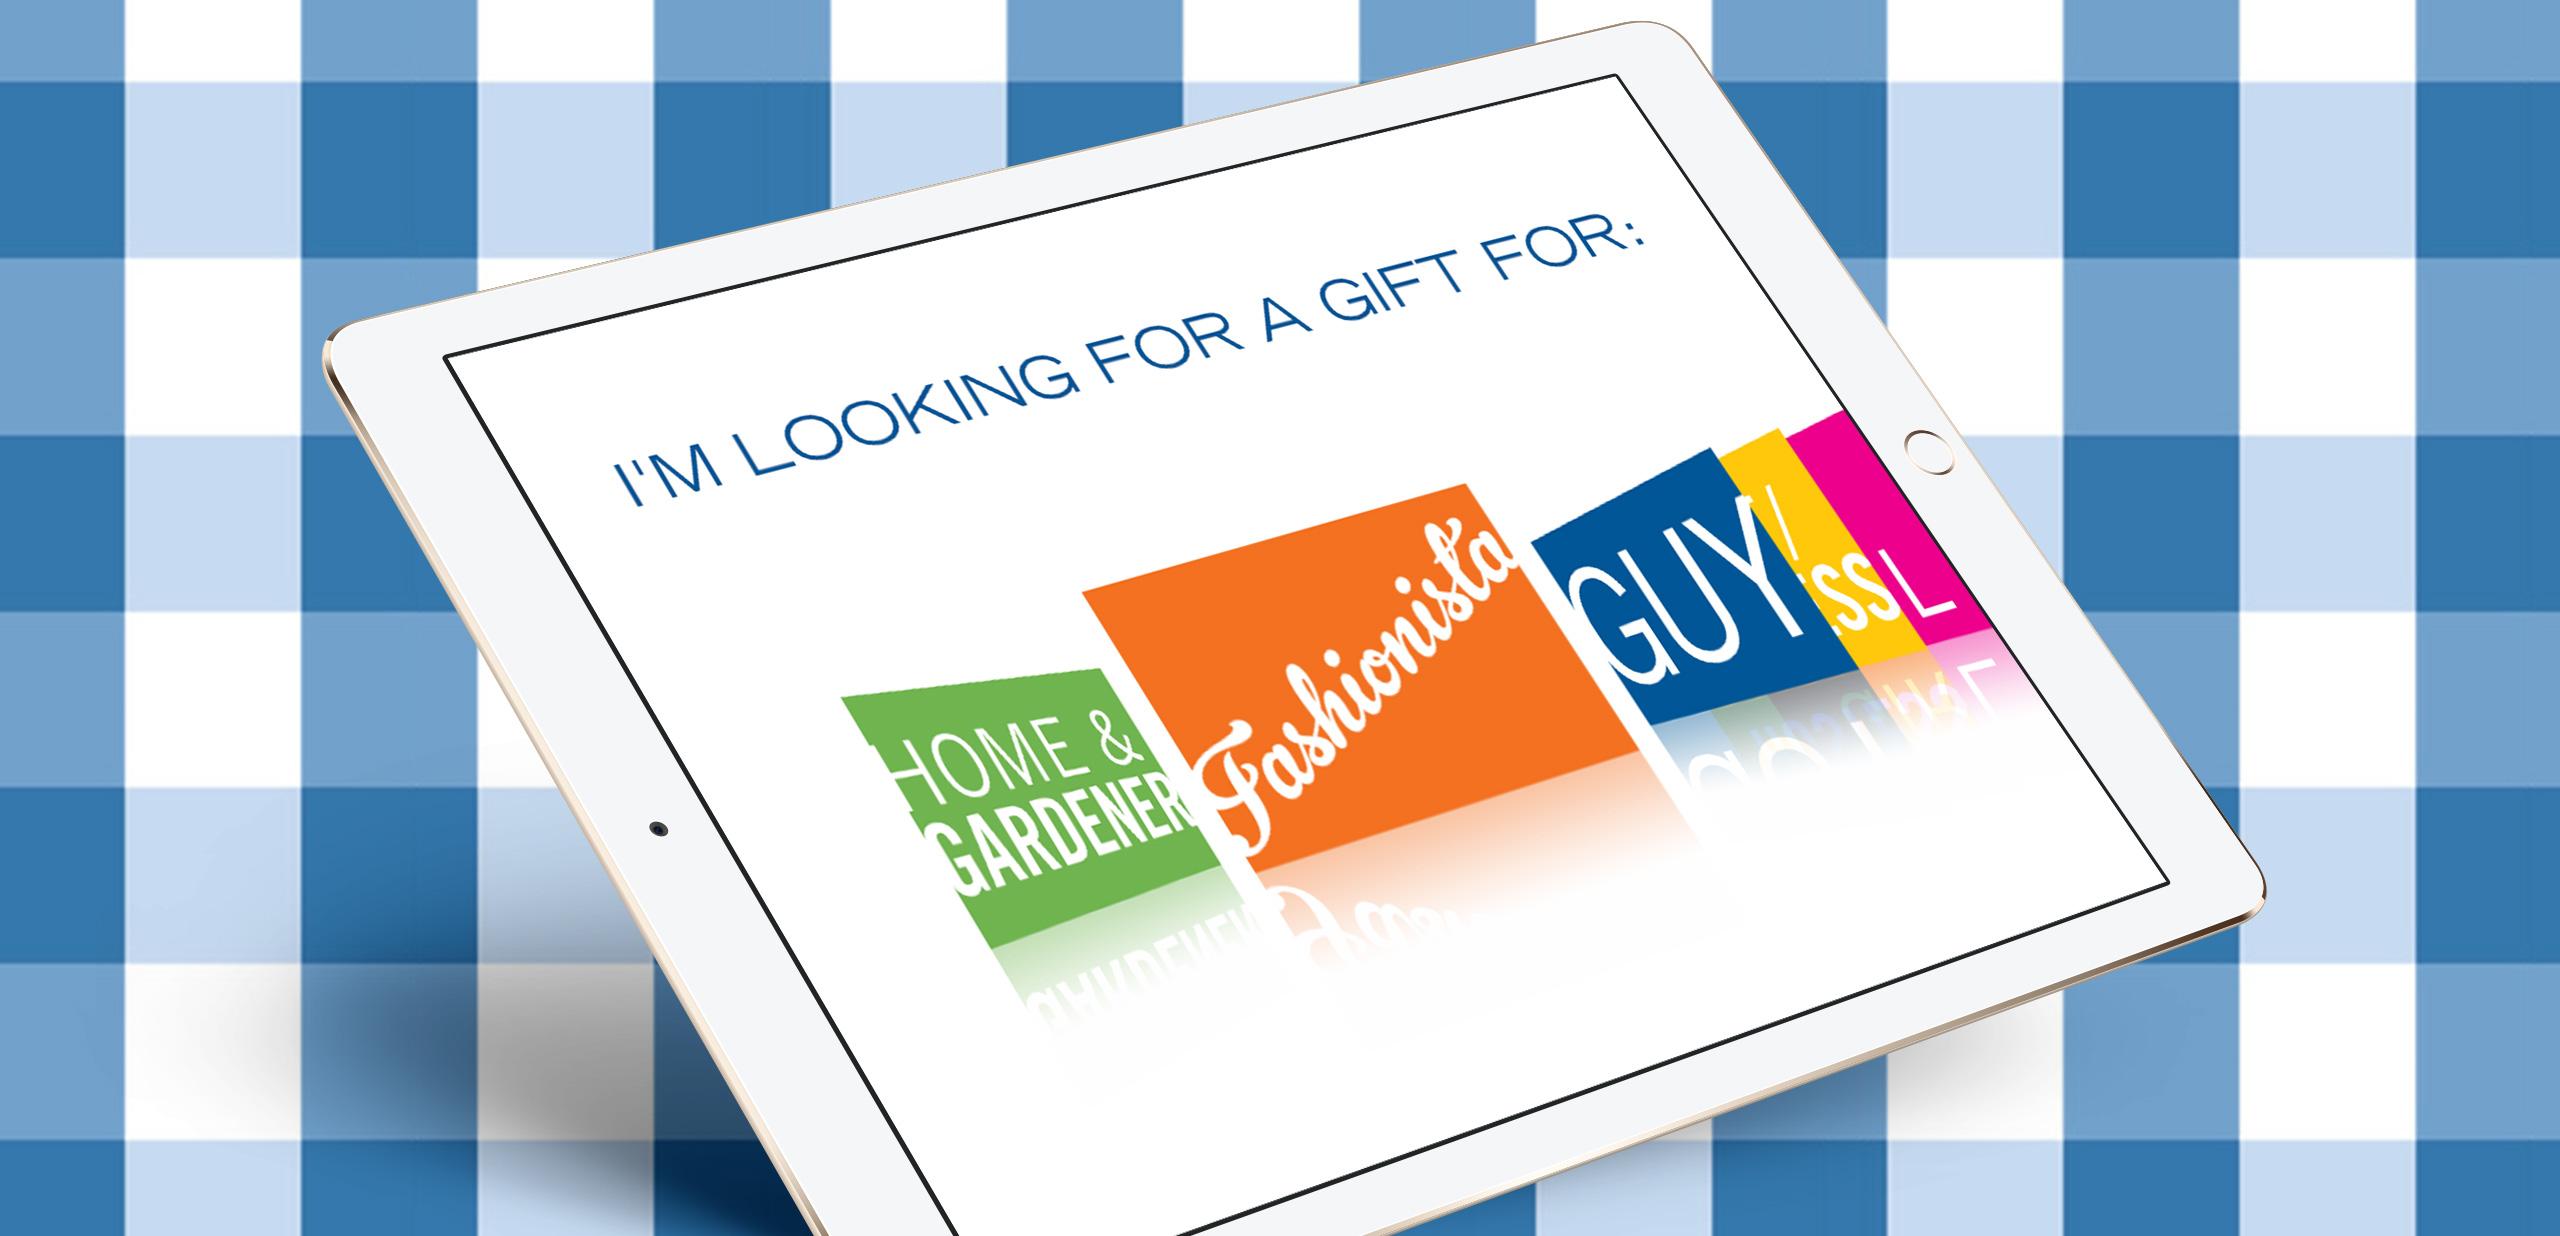 Mobile application Gift Finder increases sales for